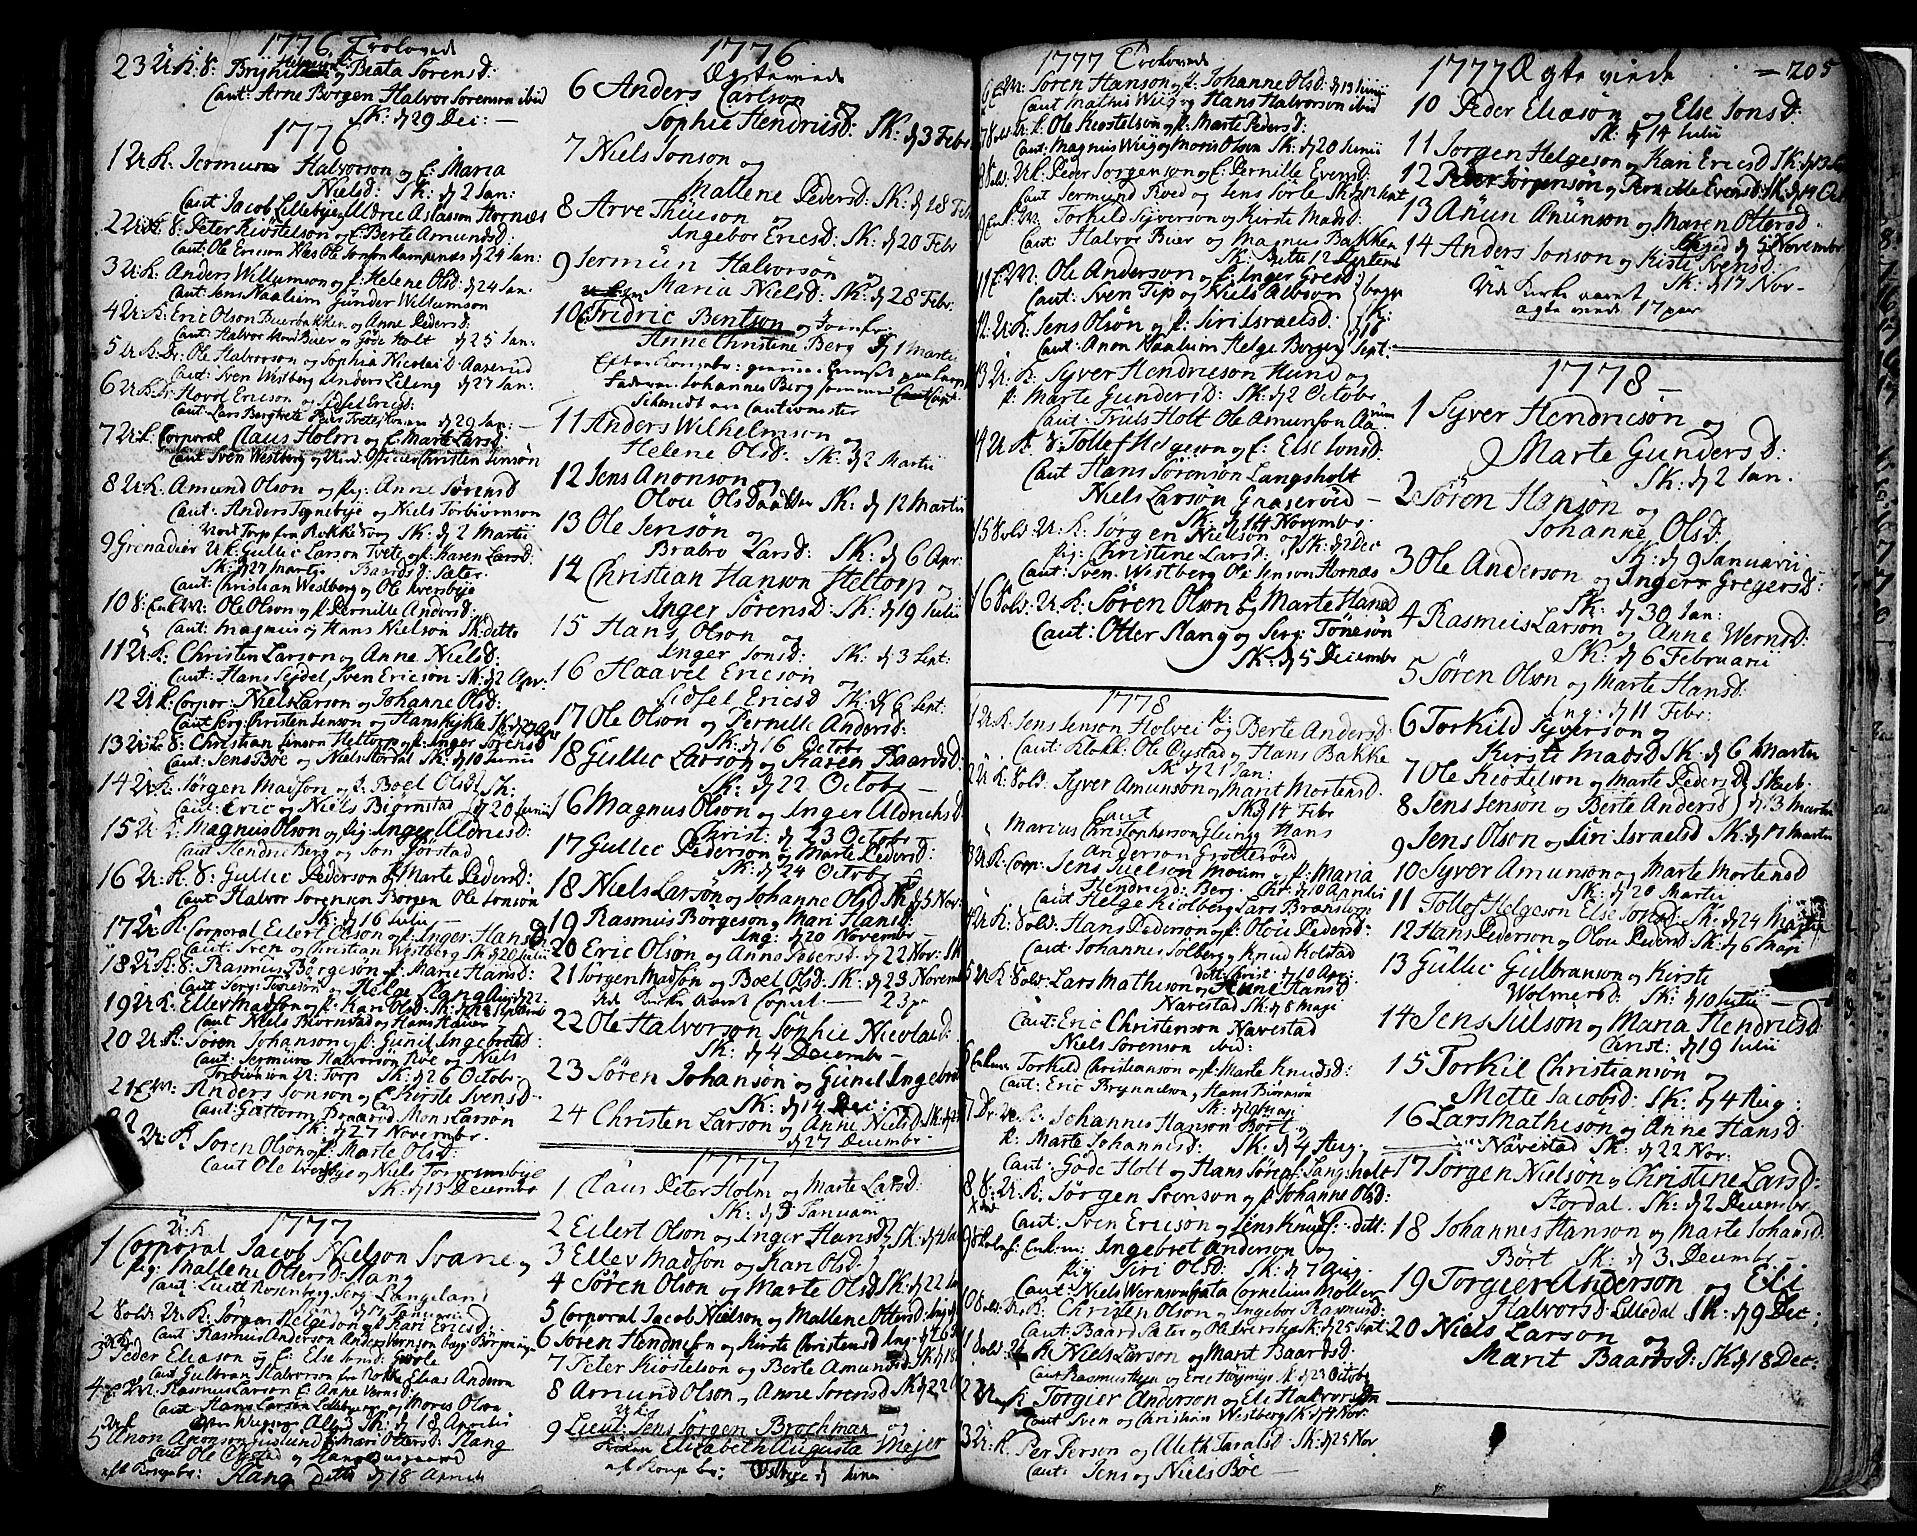 SAO, Skjeberg prestekontor Kirkebøker, F/Fa/L0002: Parish register (official) no. I 2, 1726-1791, p. 205